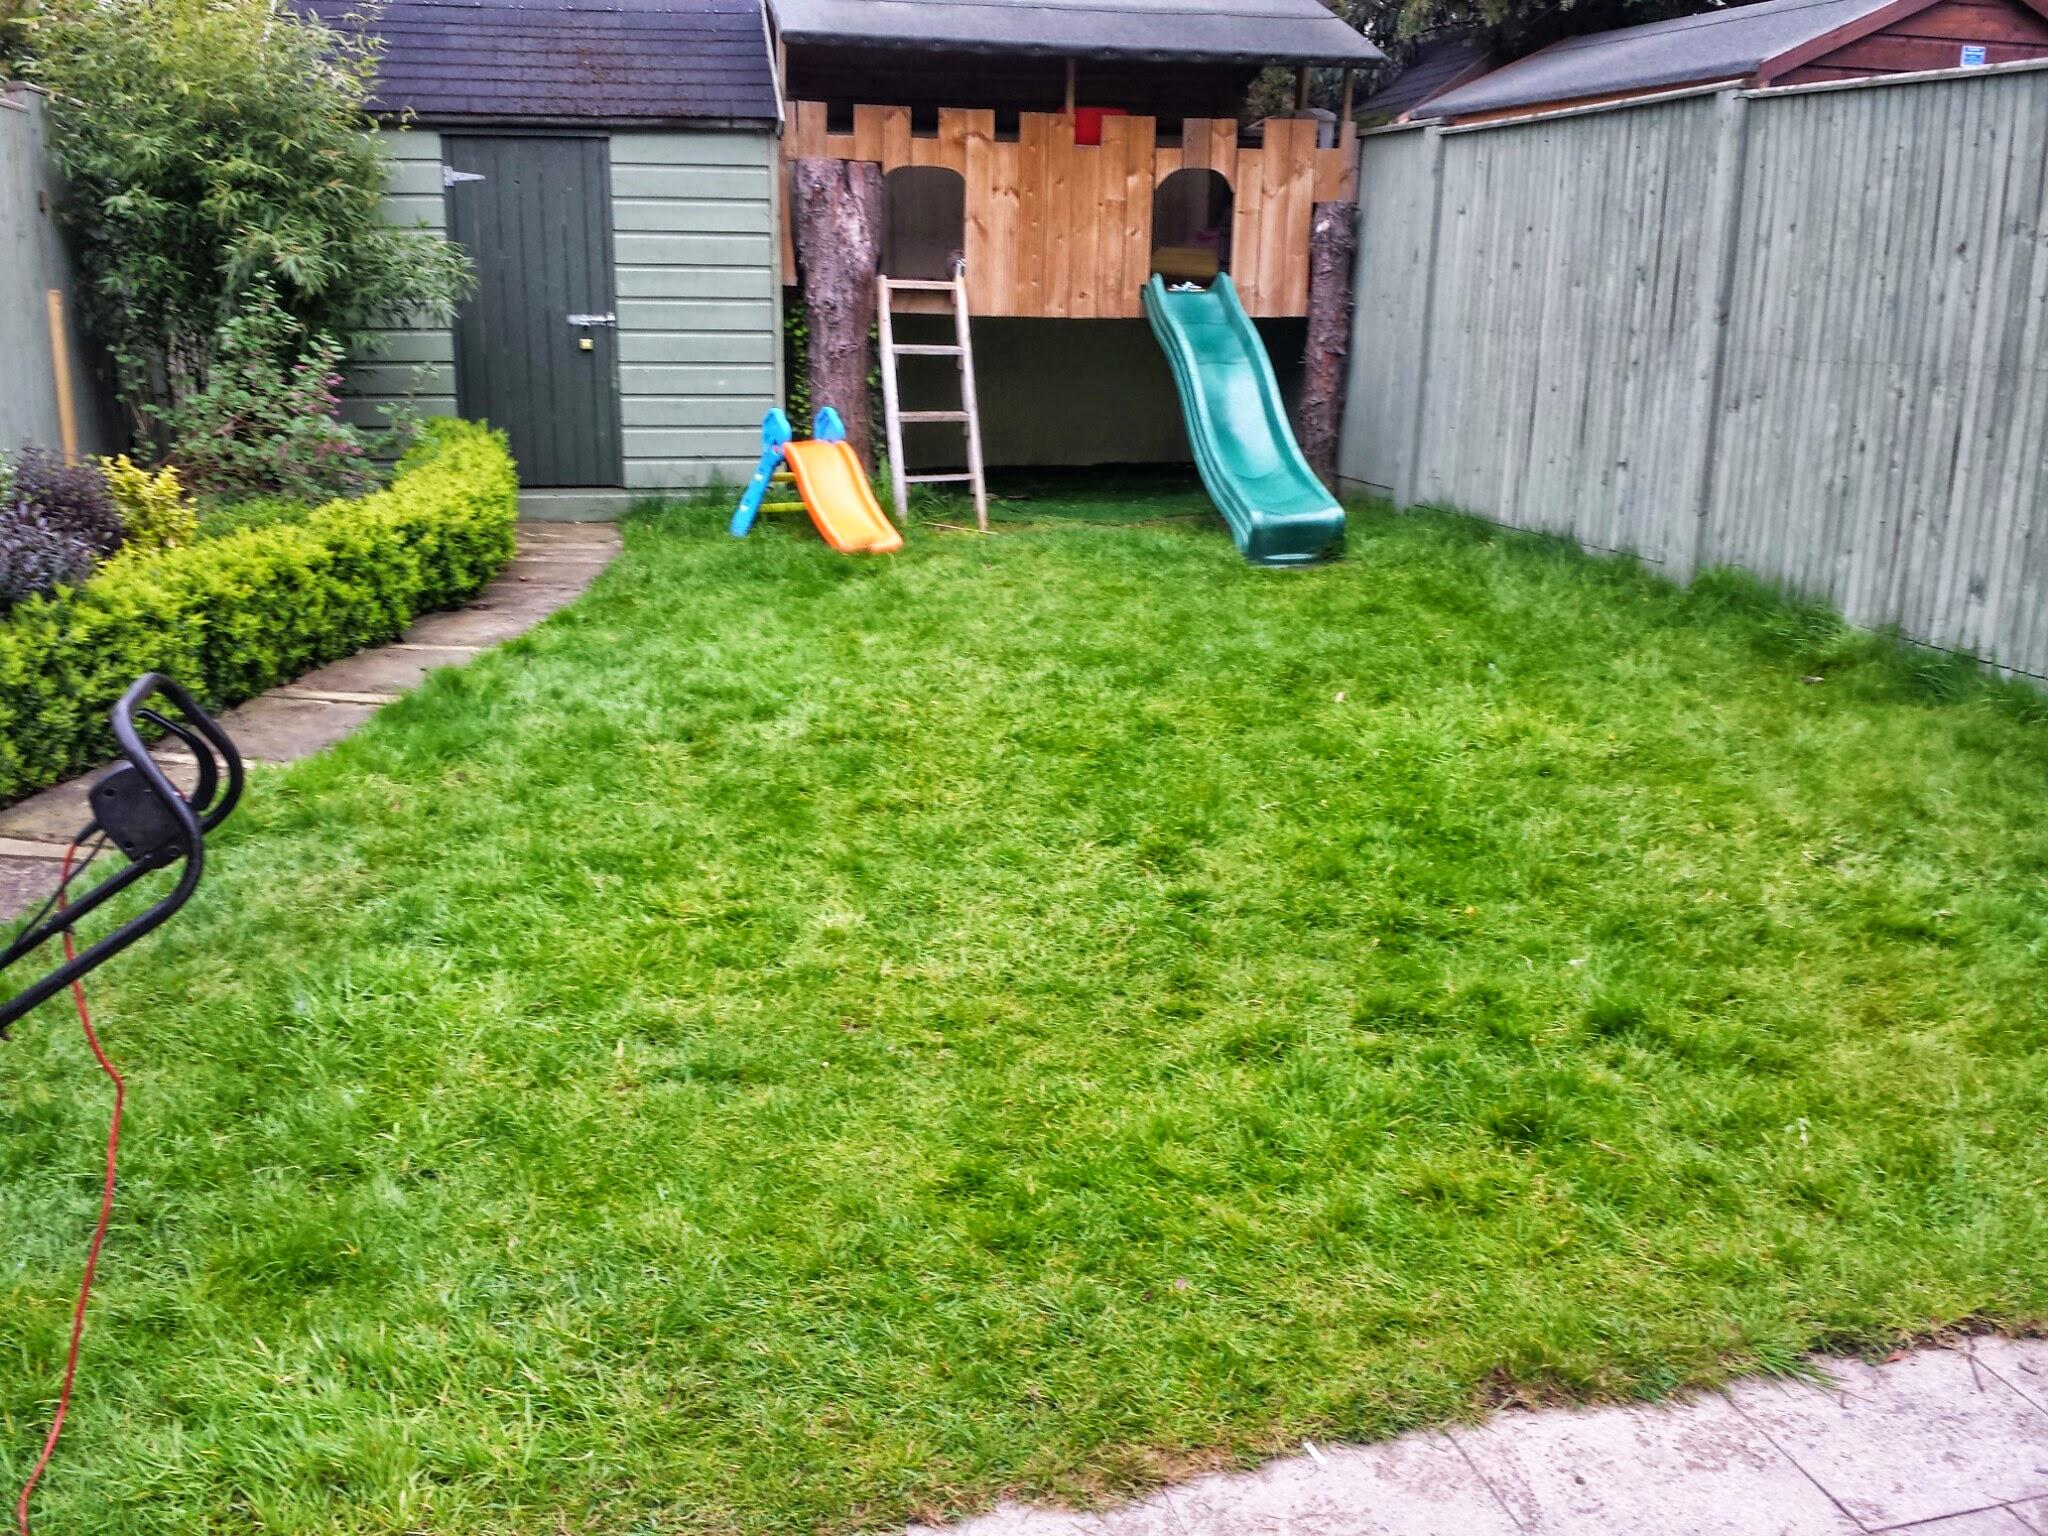 overgrown lawn in back garden